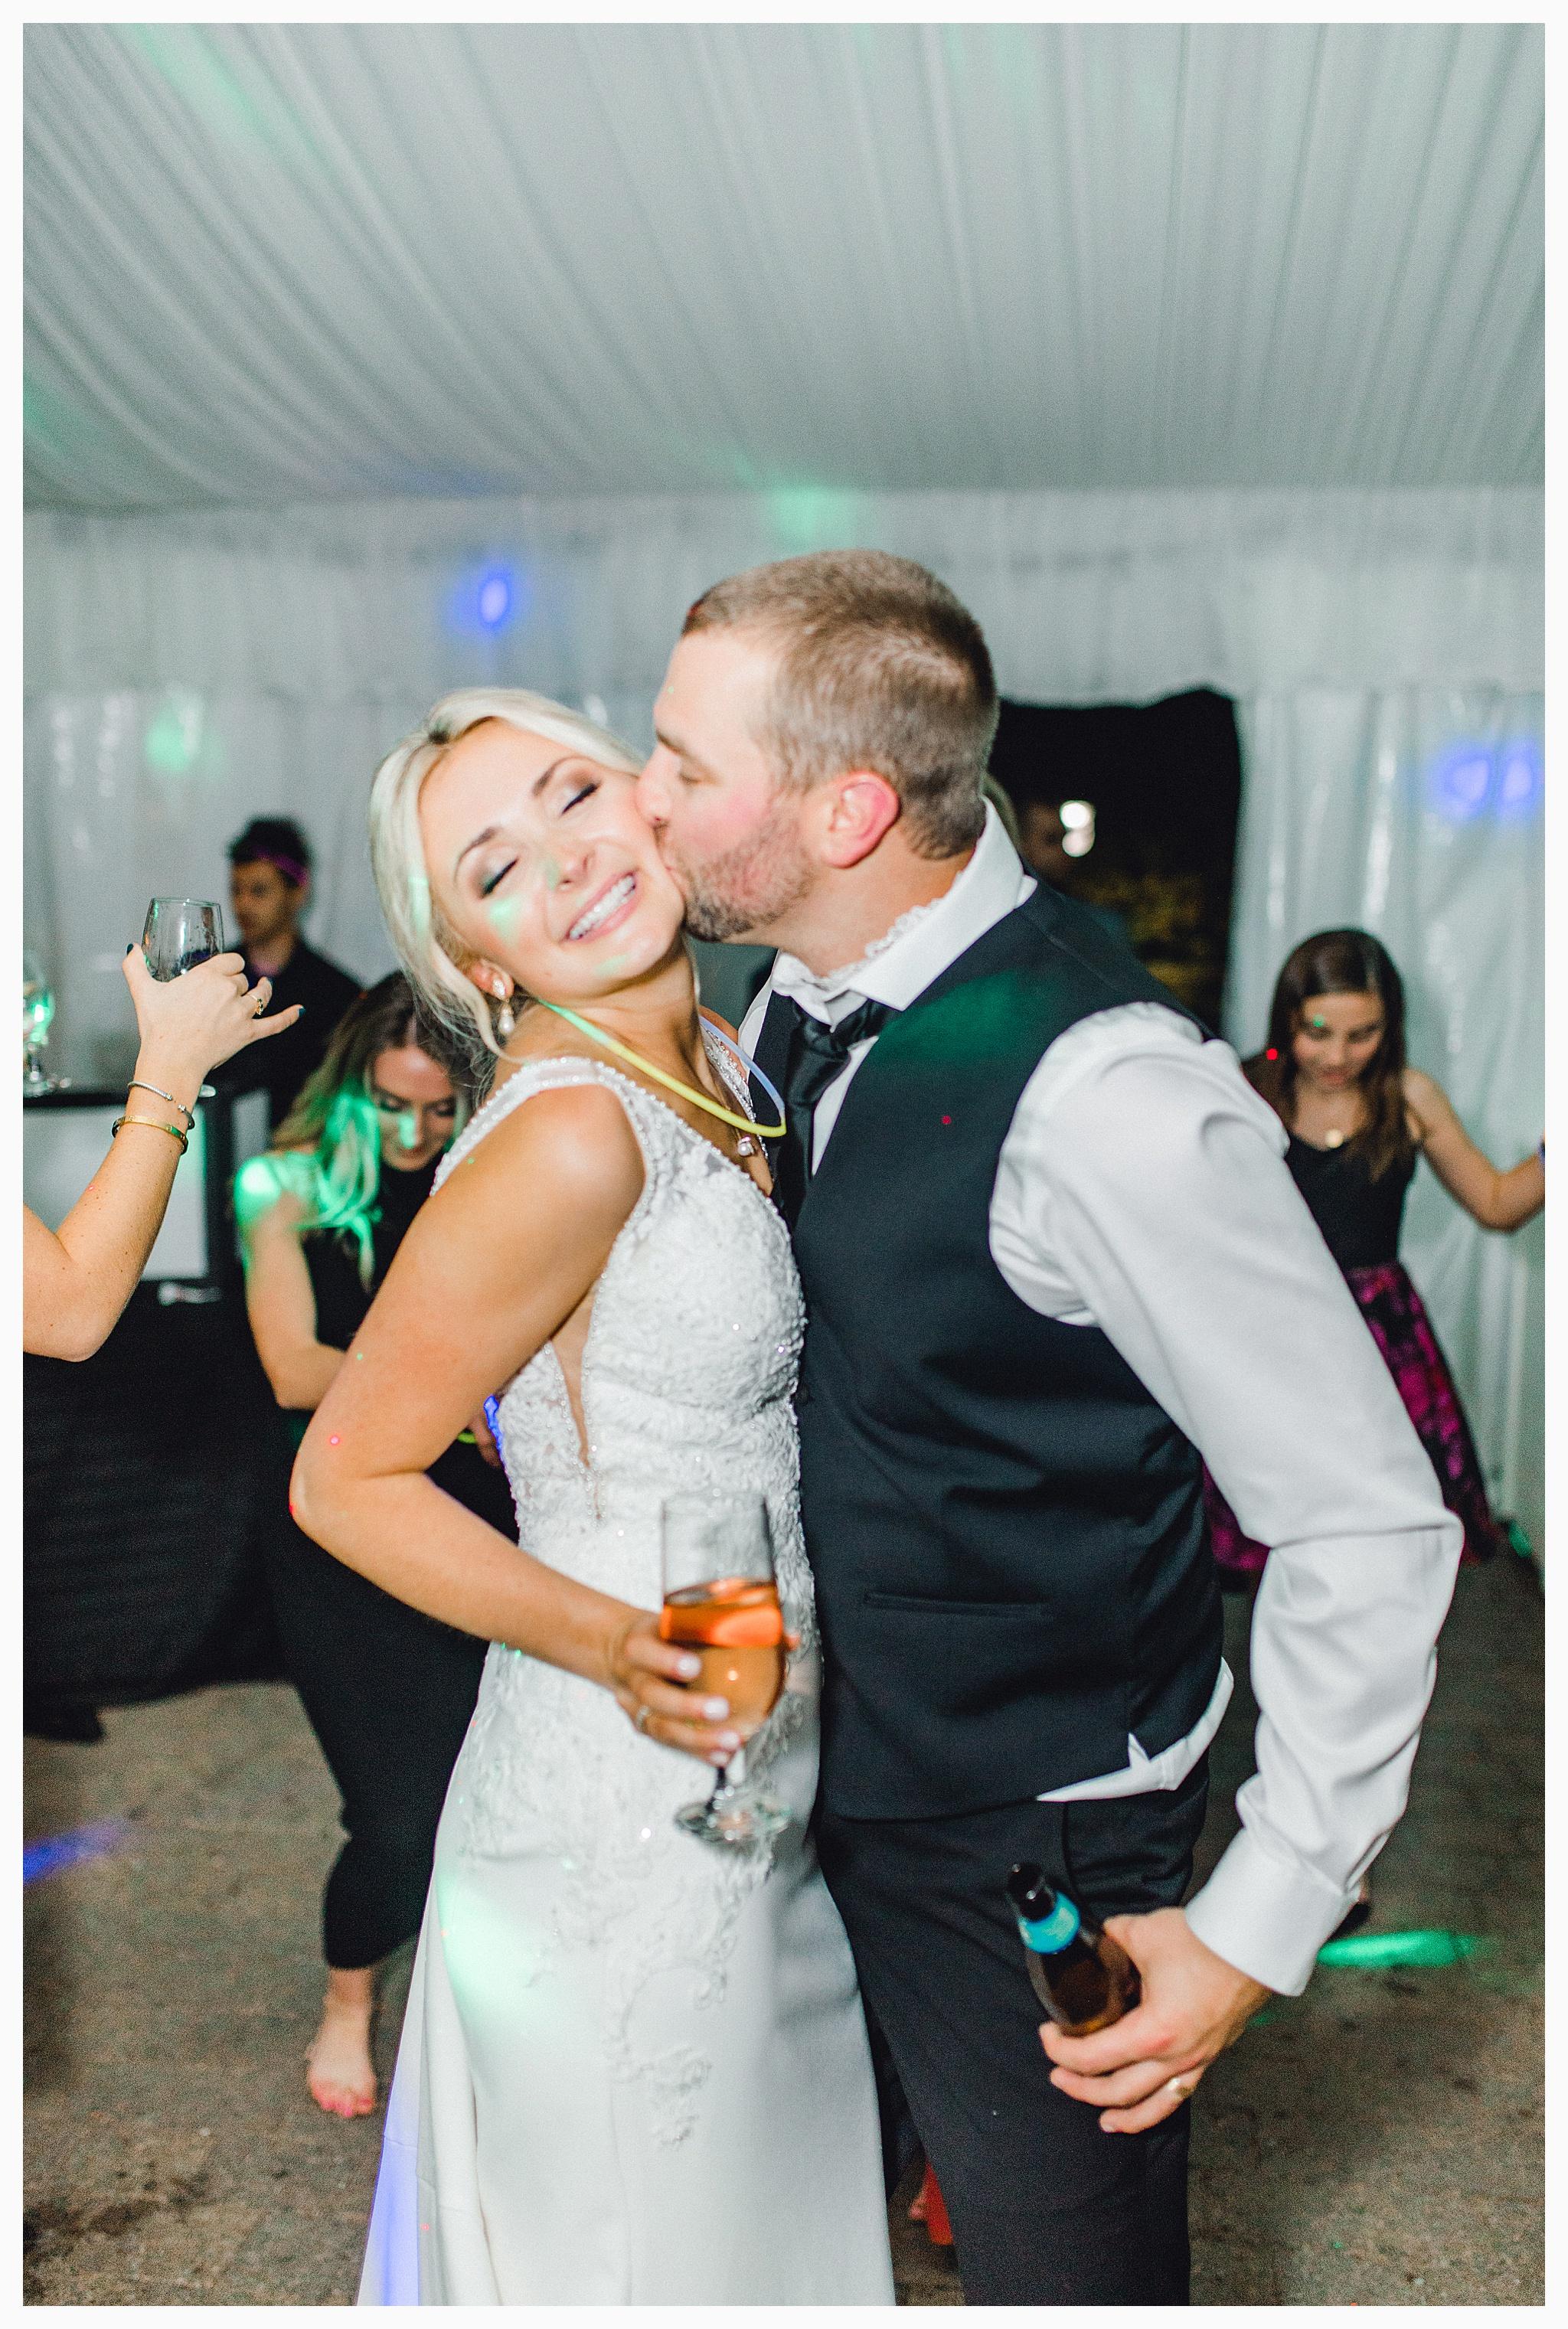 Emma Rose Company Light and Airy Wedding Photographer, Beautiful fall wedding at Rock Creek Gardens Venue in Puyallup, Washington._0132.jpg